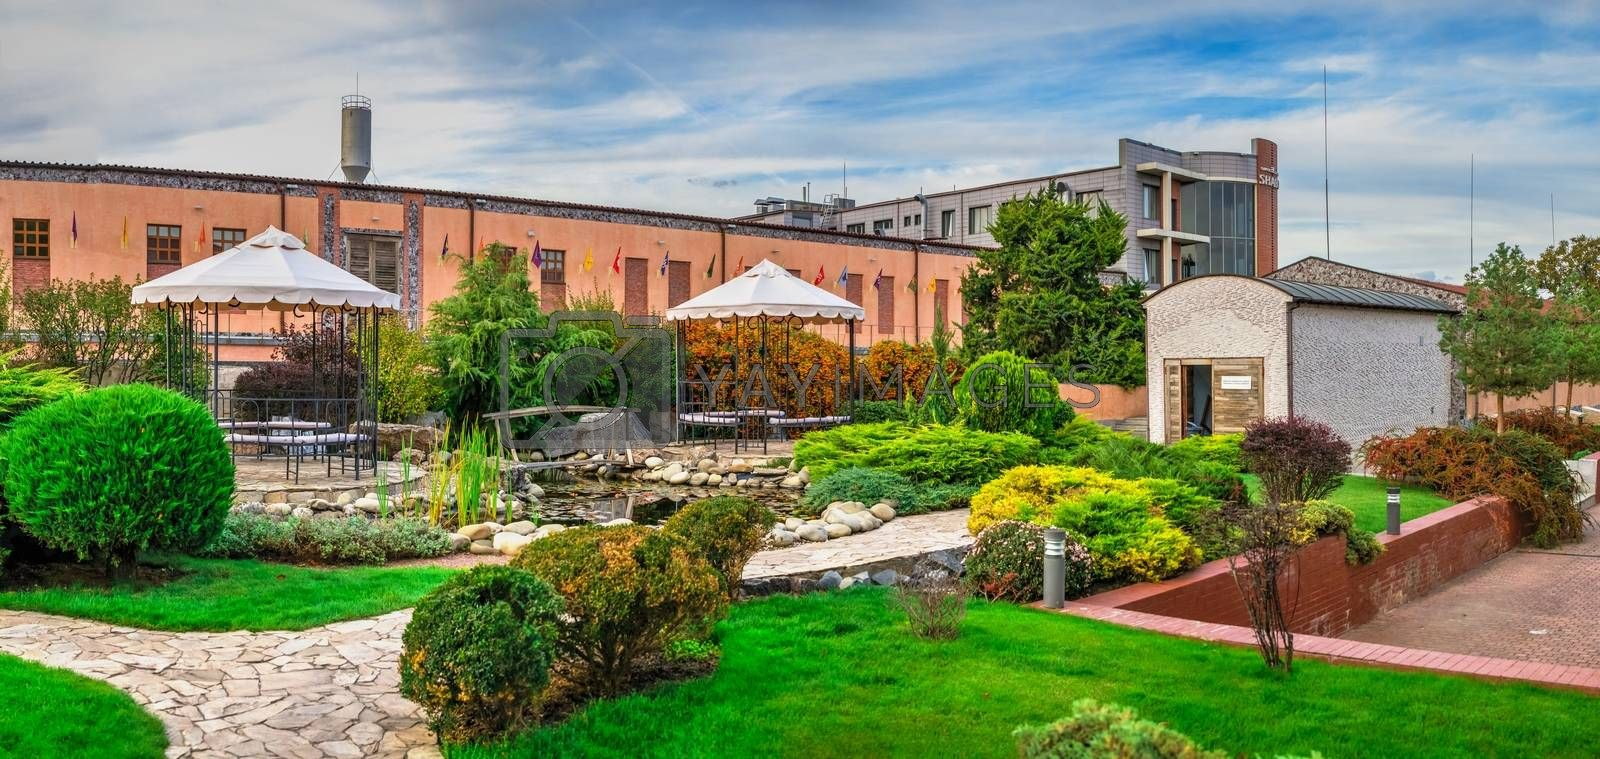 Shabo, Ukraine 09.29.2019. Small garden in the Shabo winery, Odessa region, Ukraine